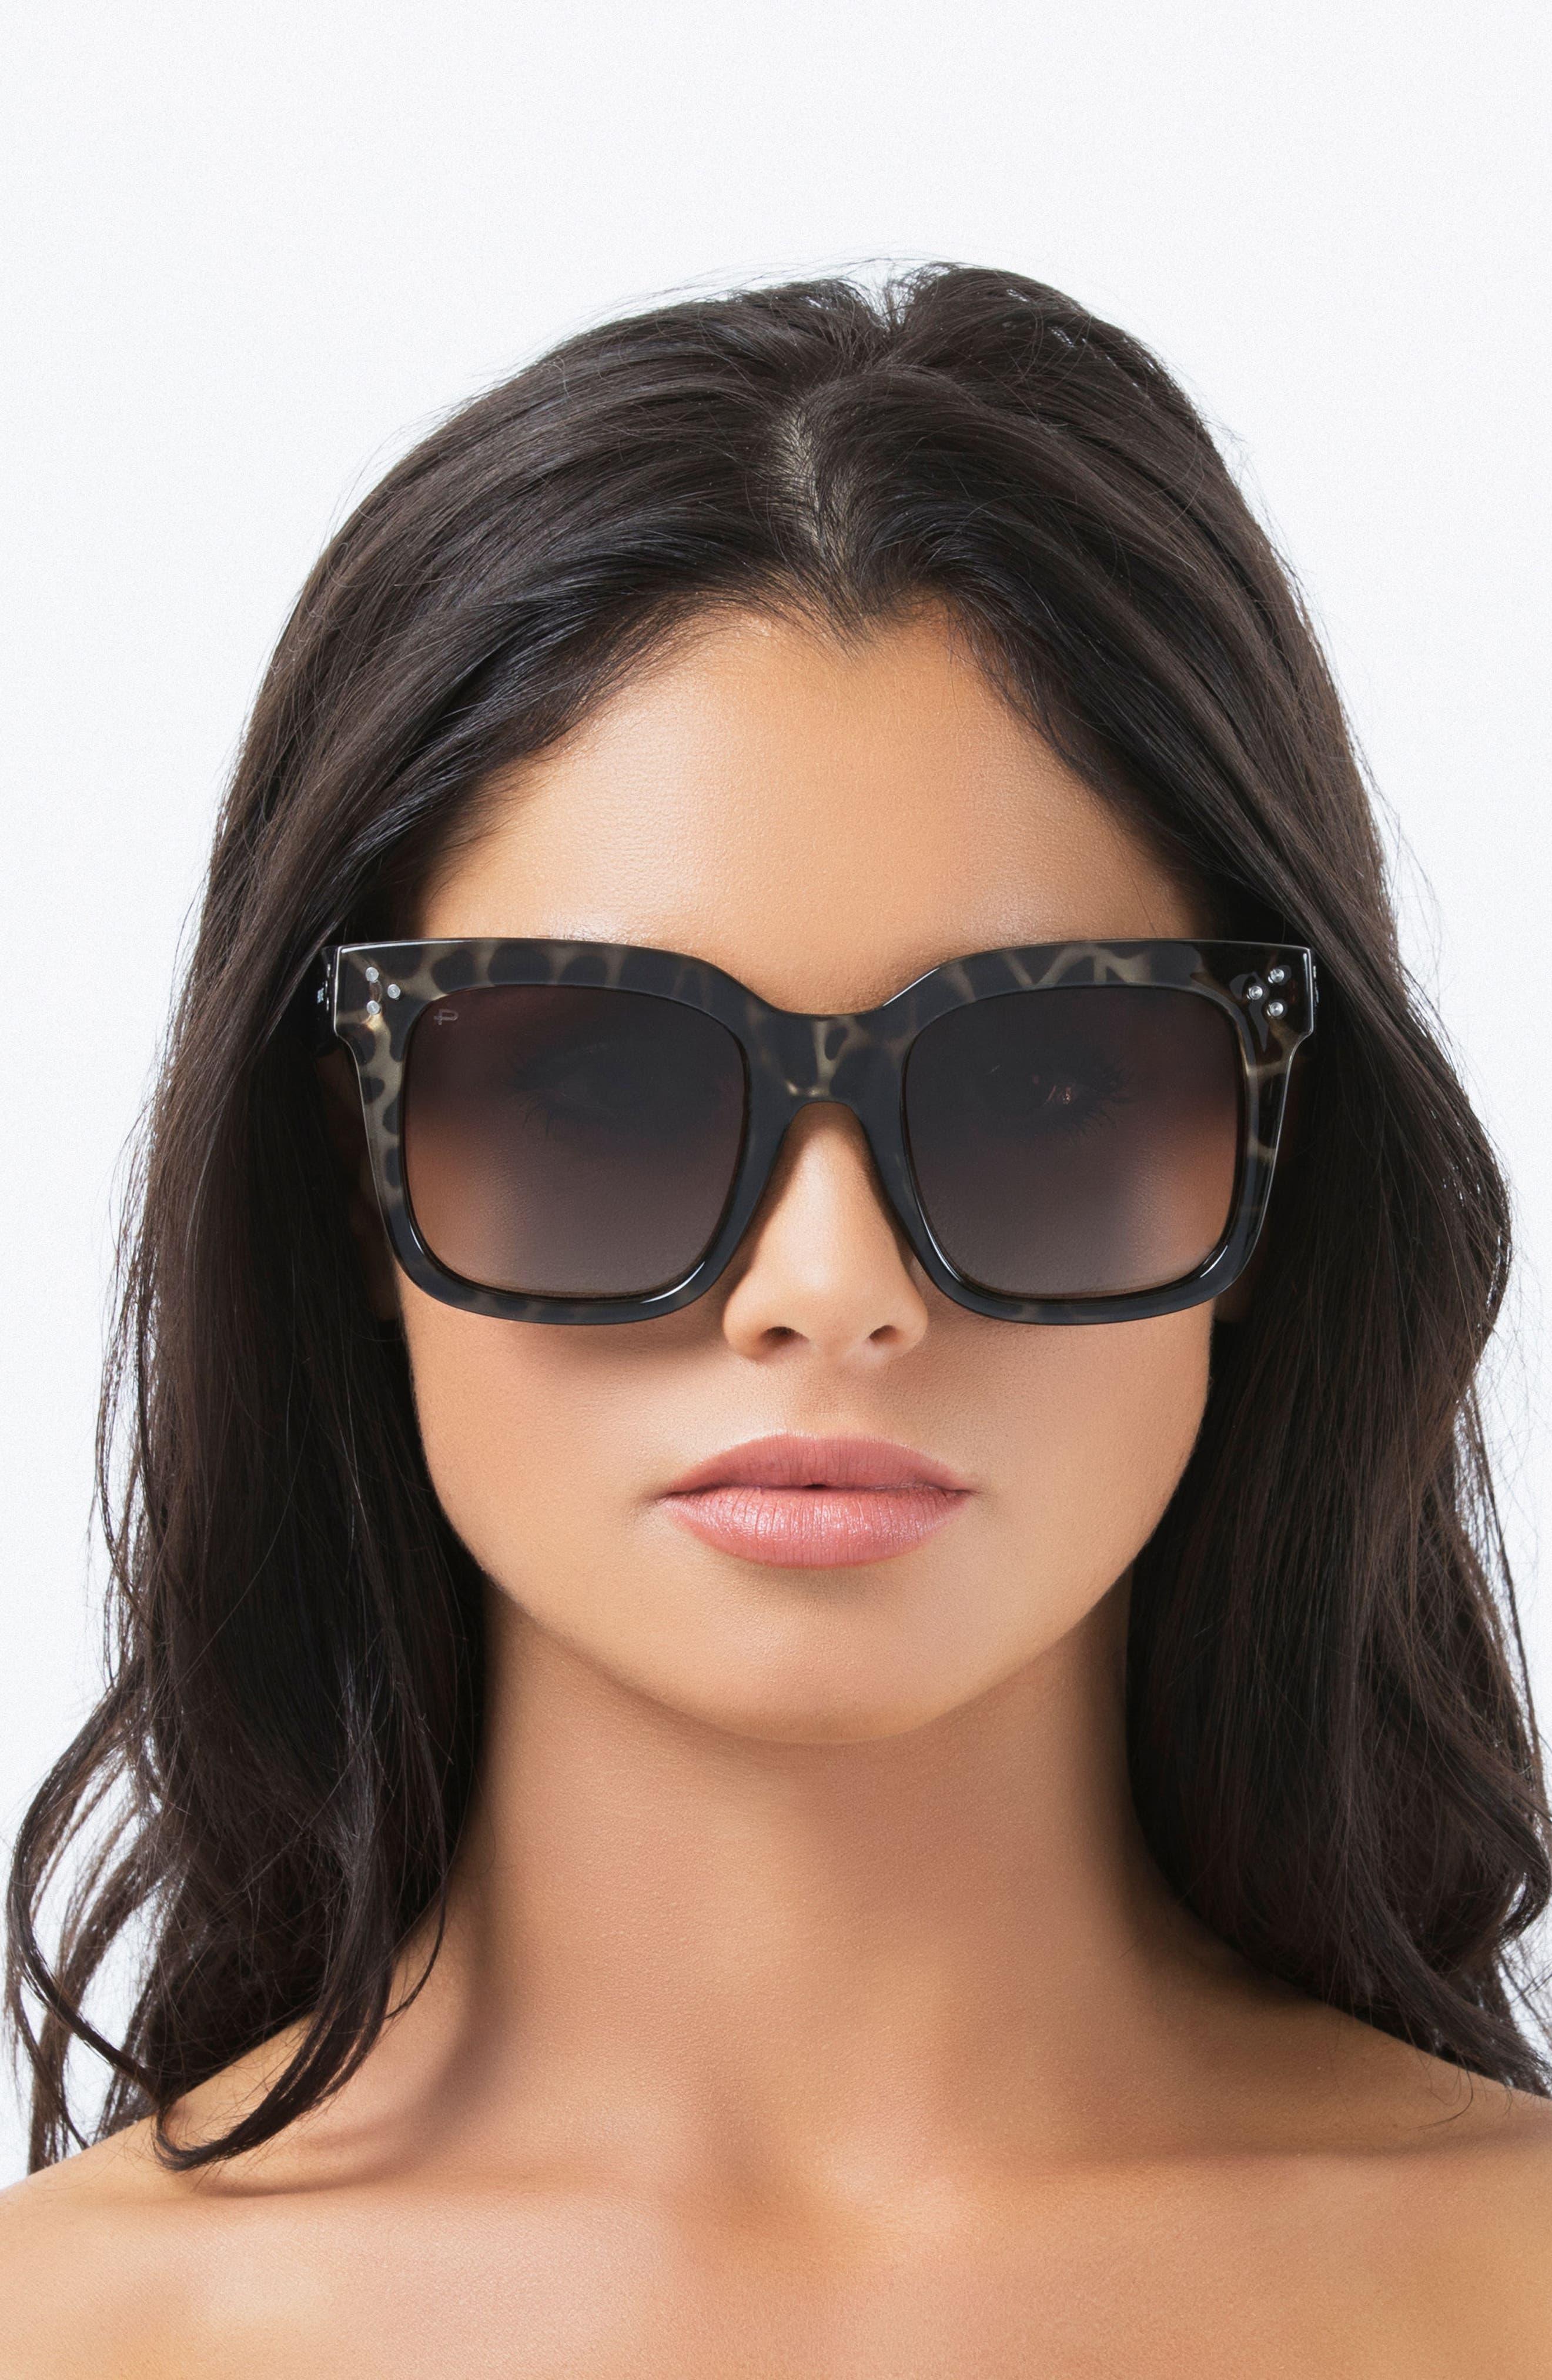 Privé Revaux The Heroine 53mm Sunglasses,                             Alternate thumbnail 5, color,